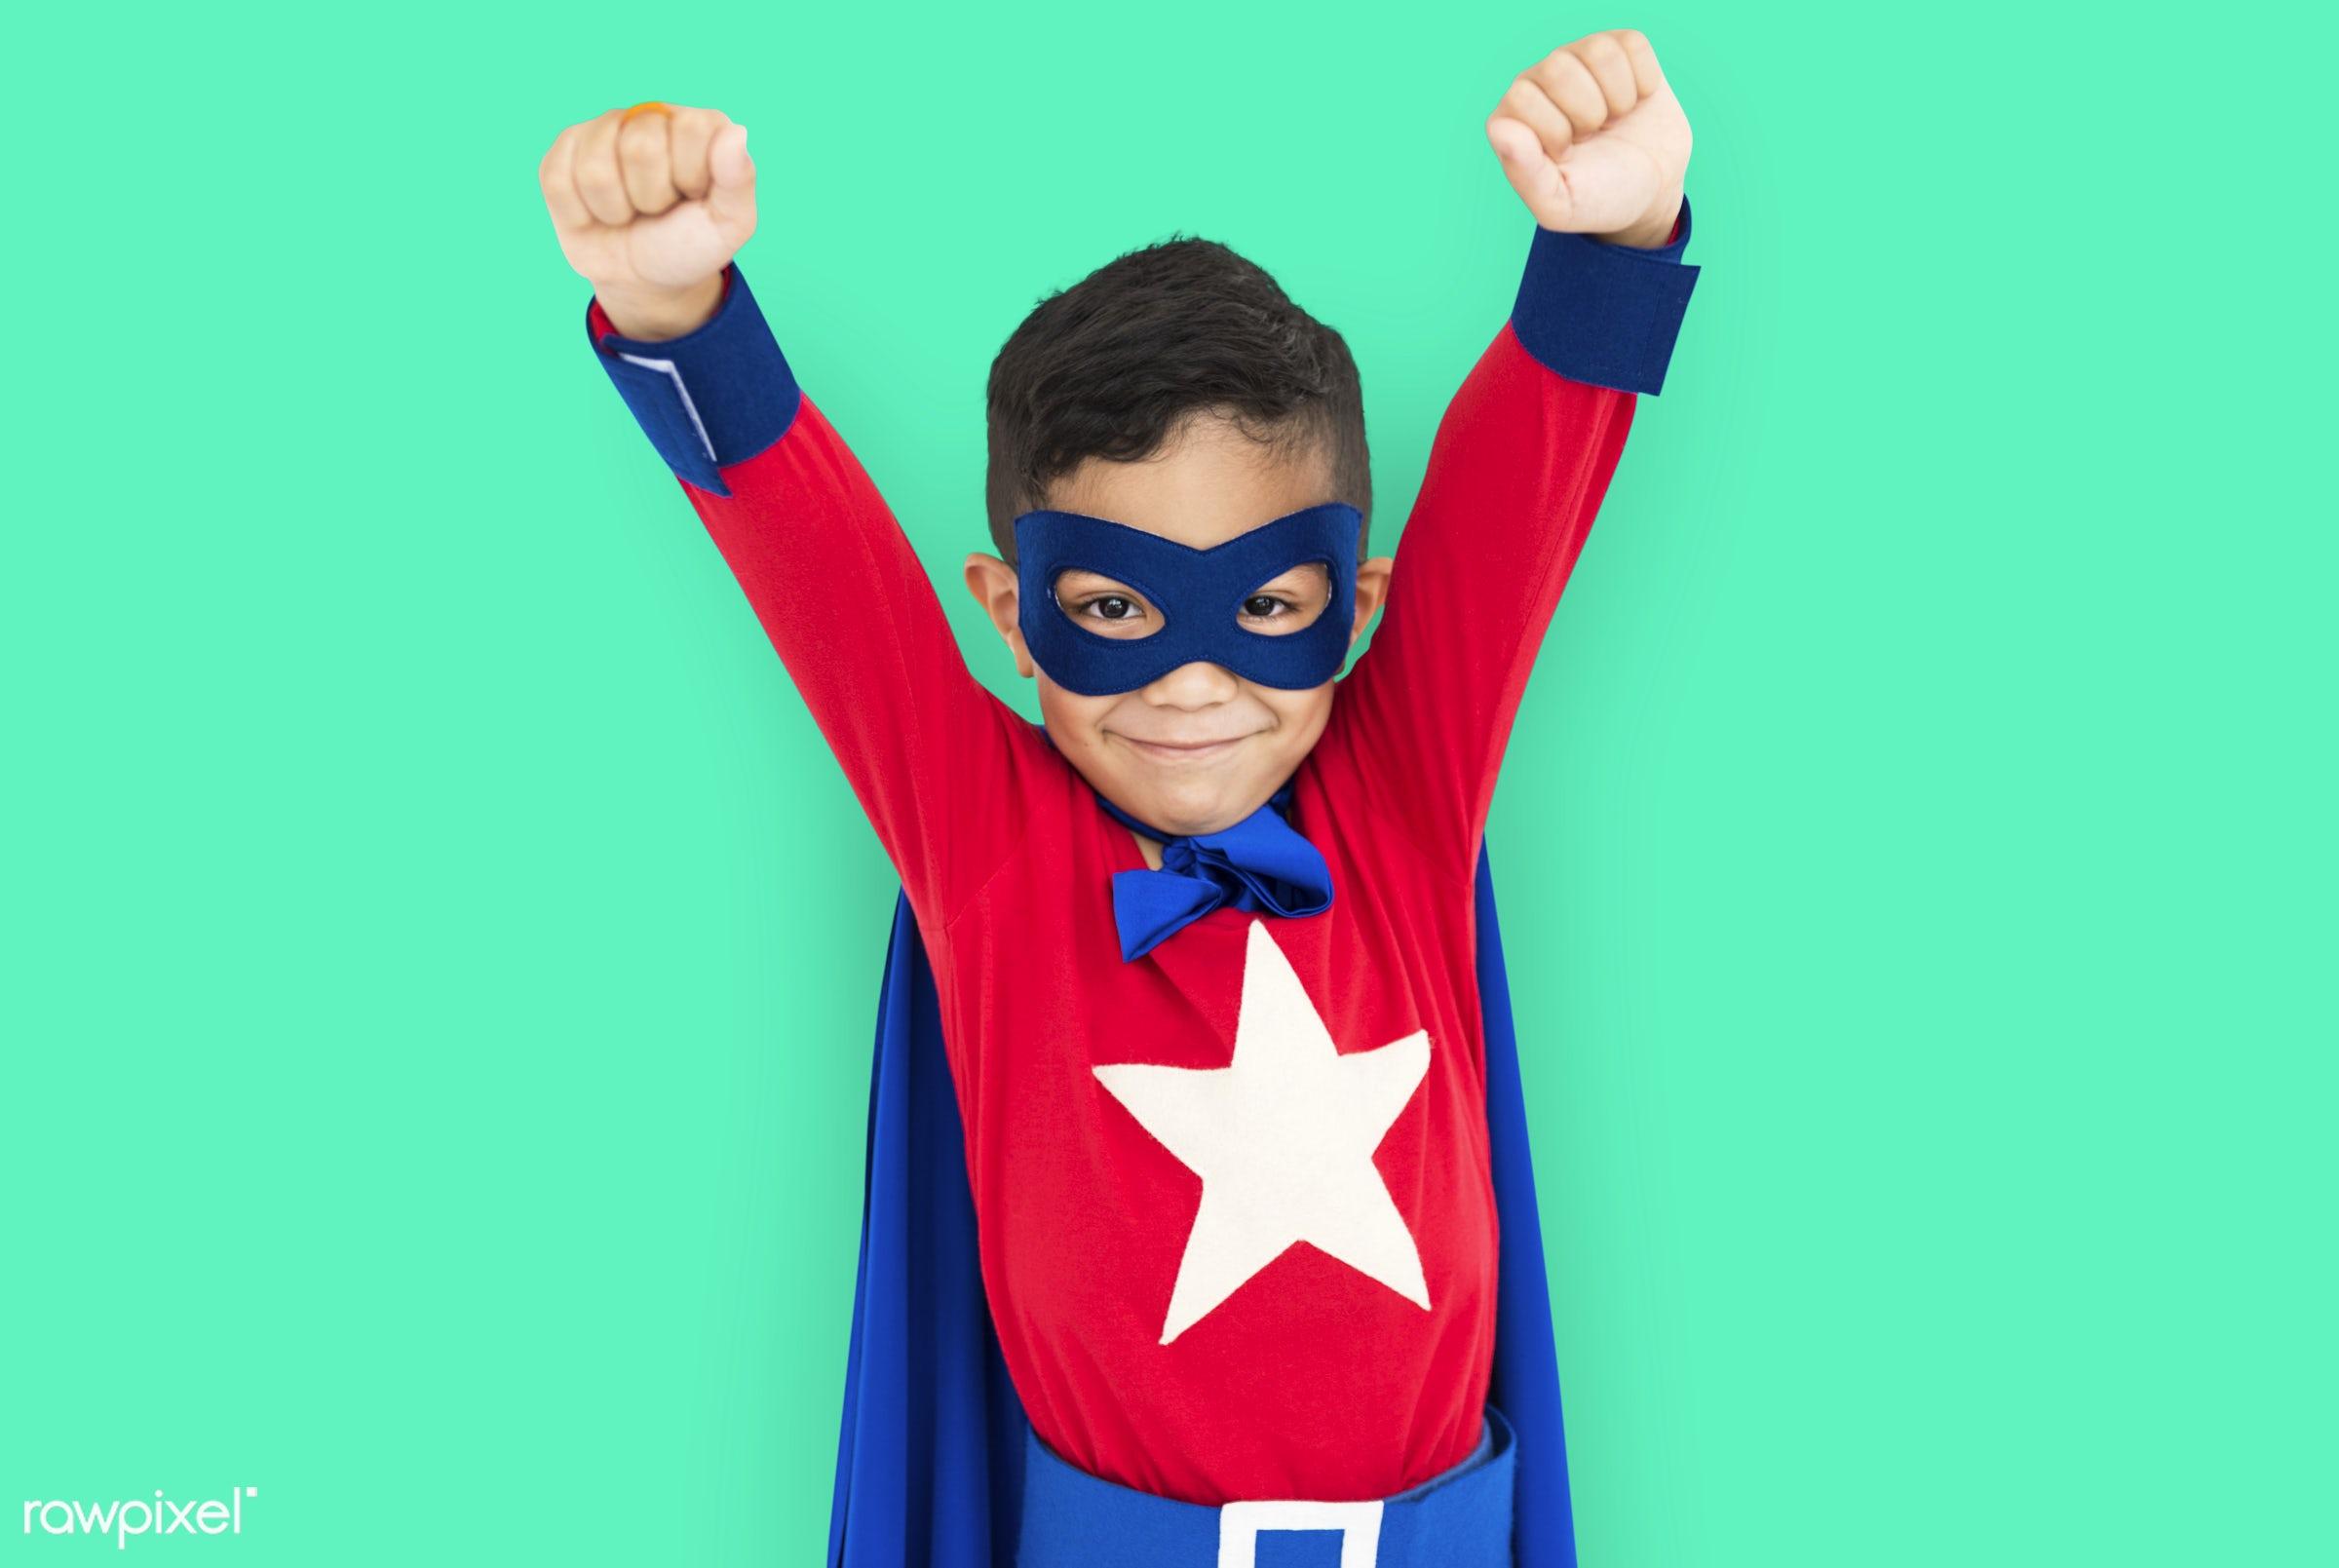 children, courageous, adolescence, kid, child, inspiration, leader, idol, childhood, superhero, isolated, hero, green,...